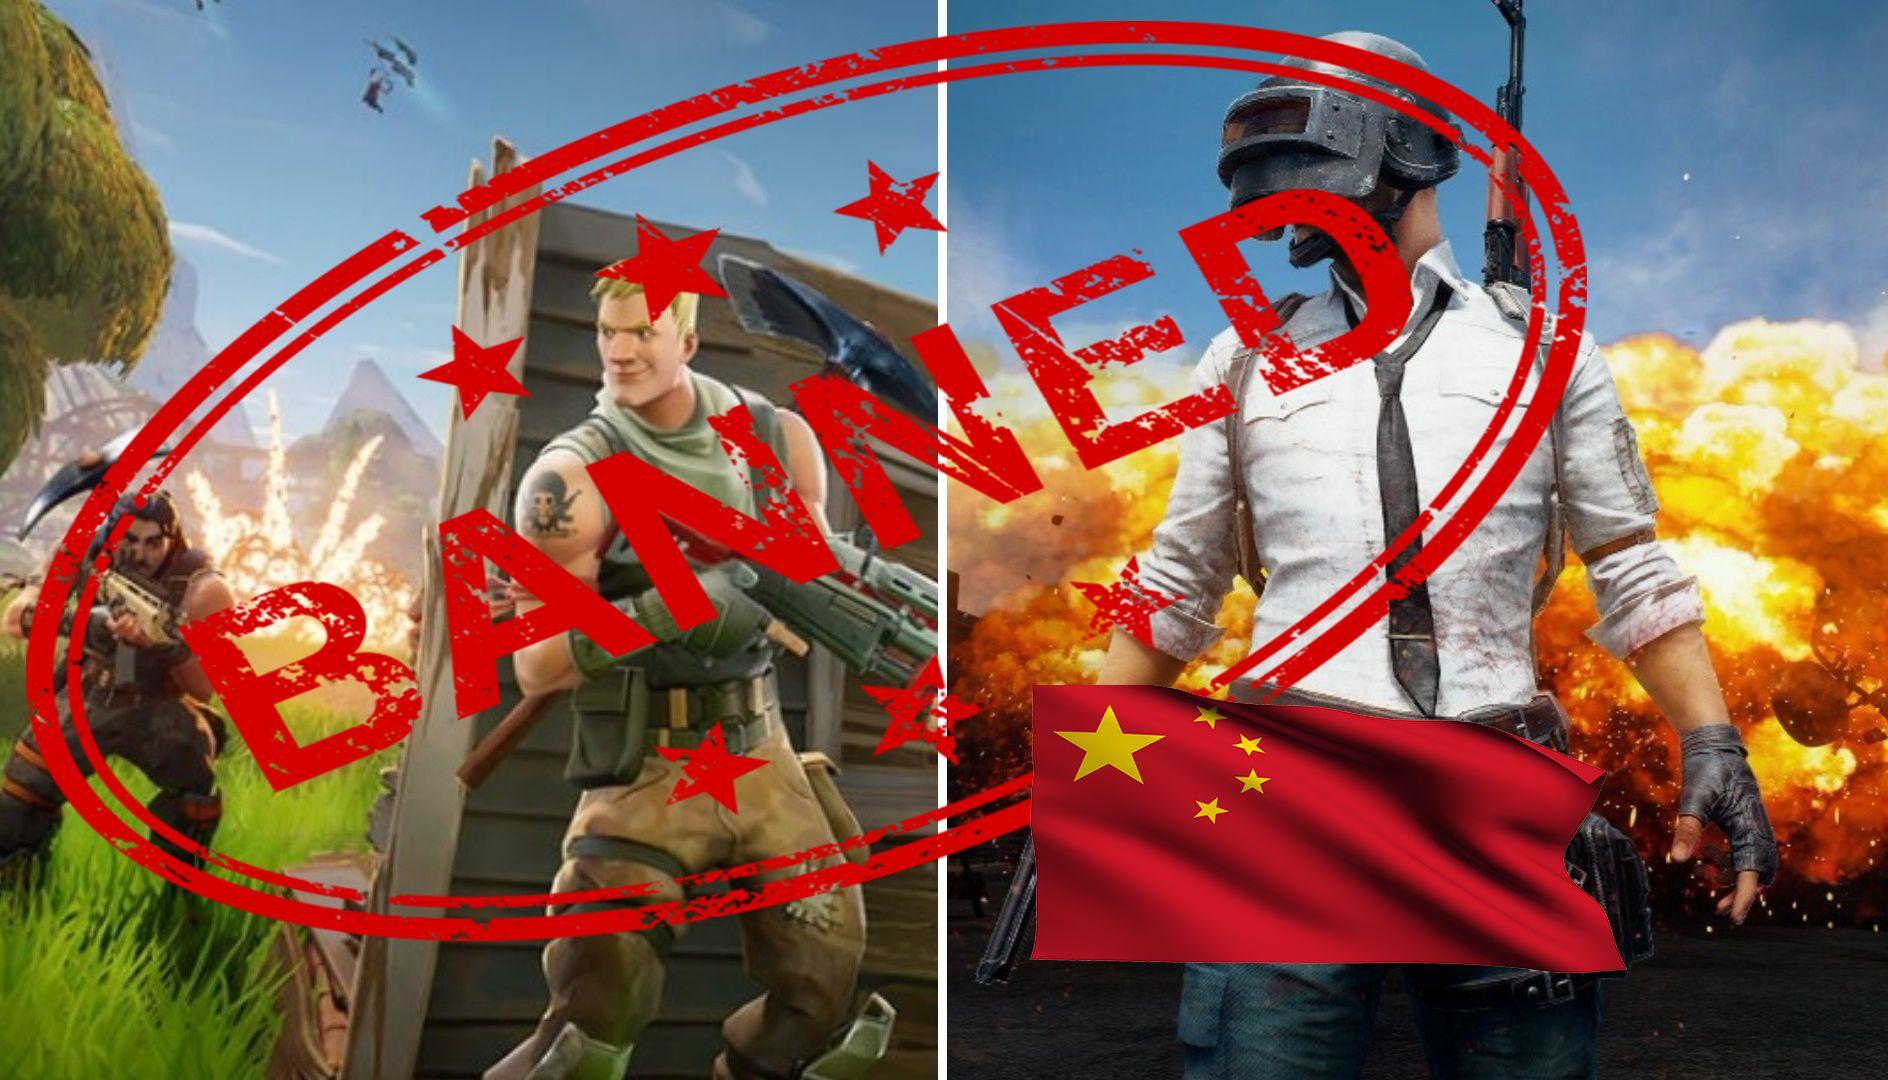 PUBG and Fortnite are Banned in China? Fortnite, Fun, China